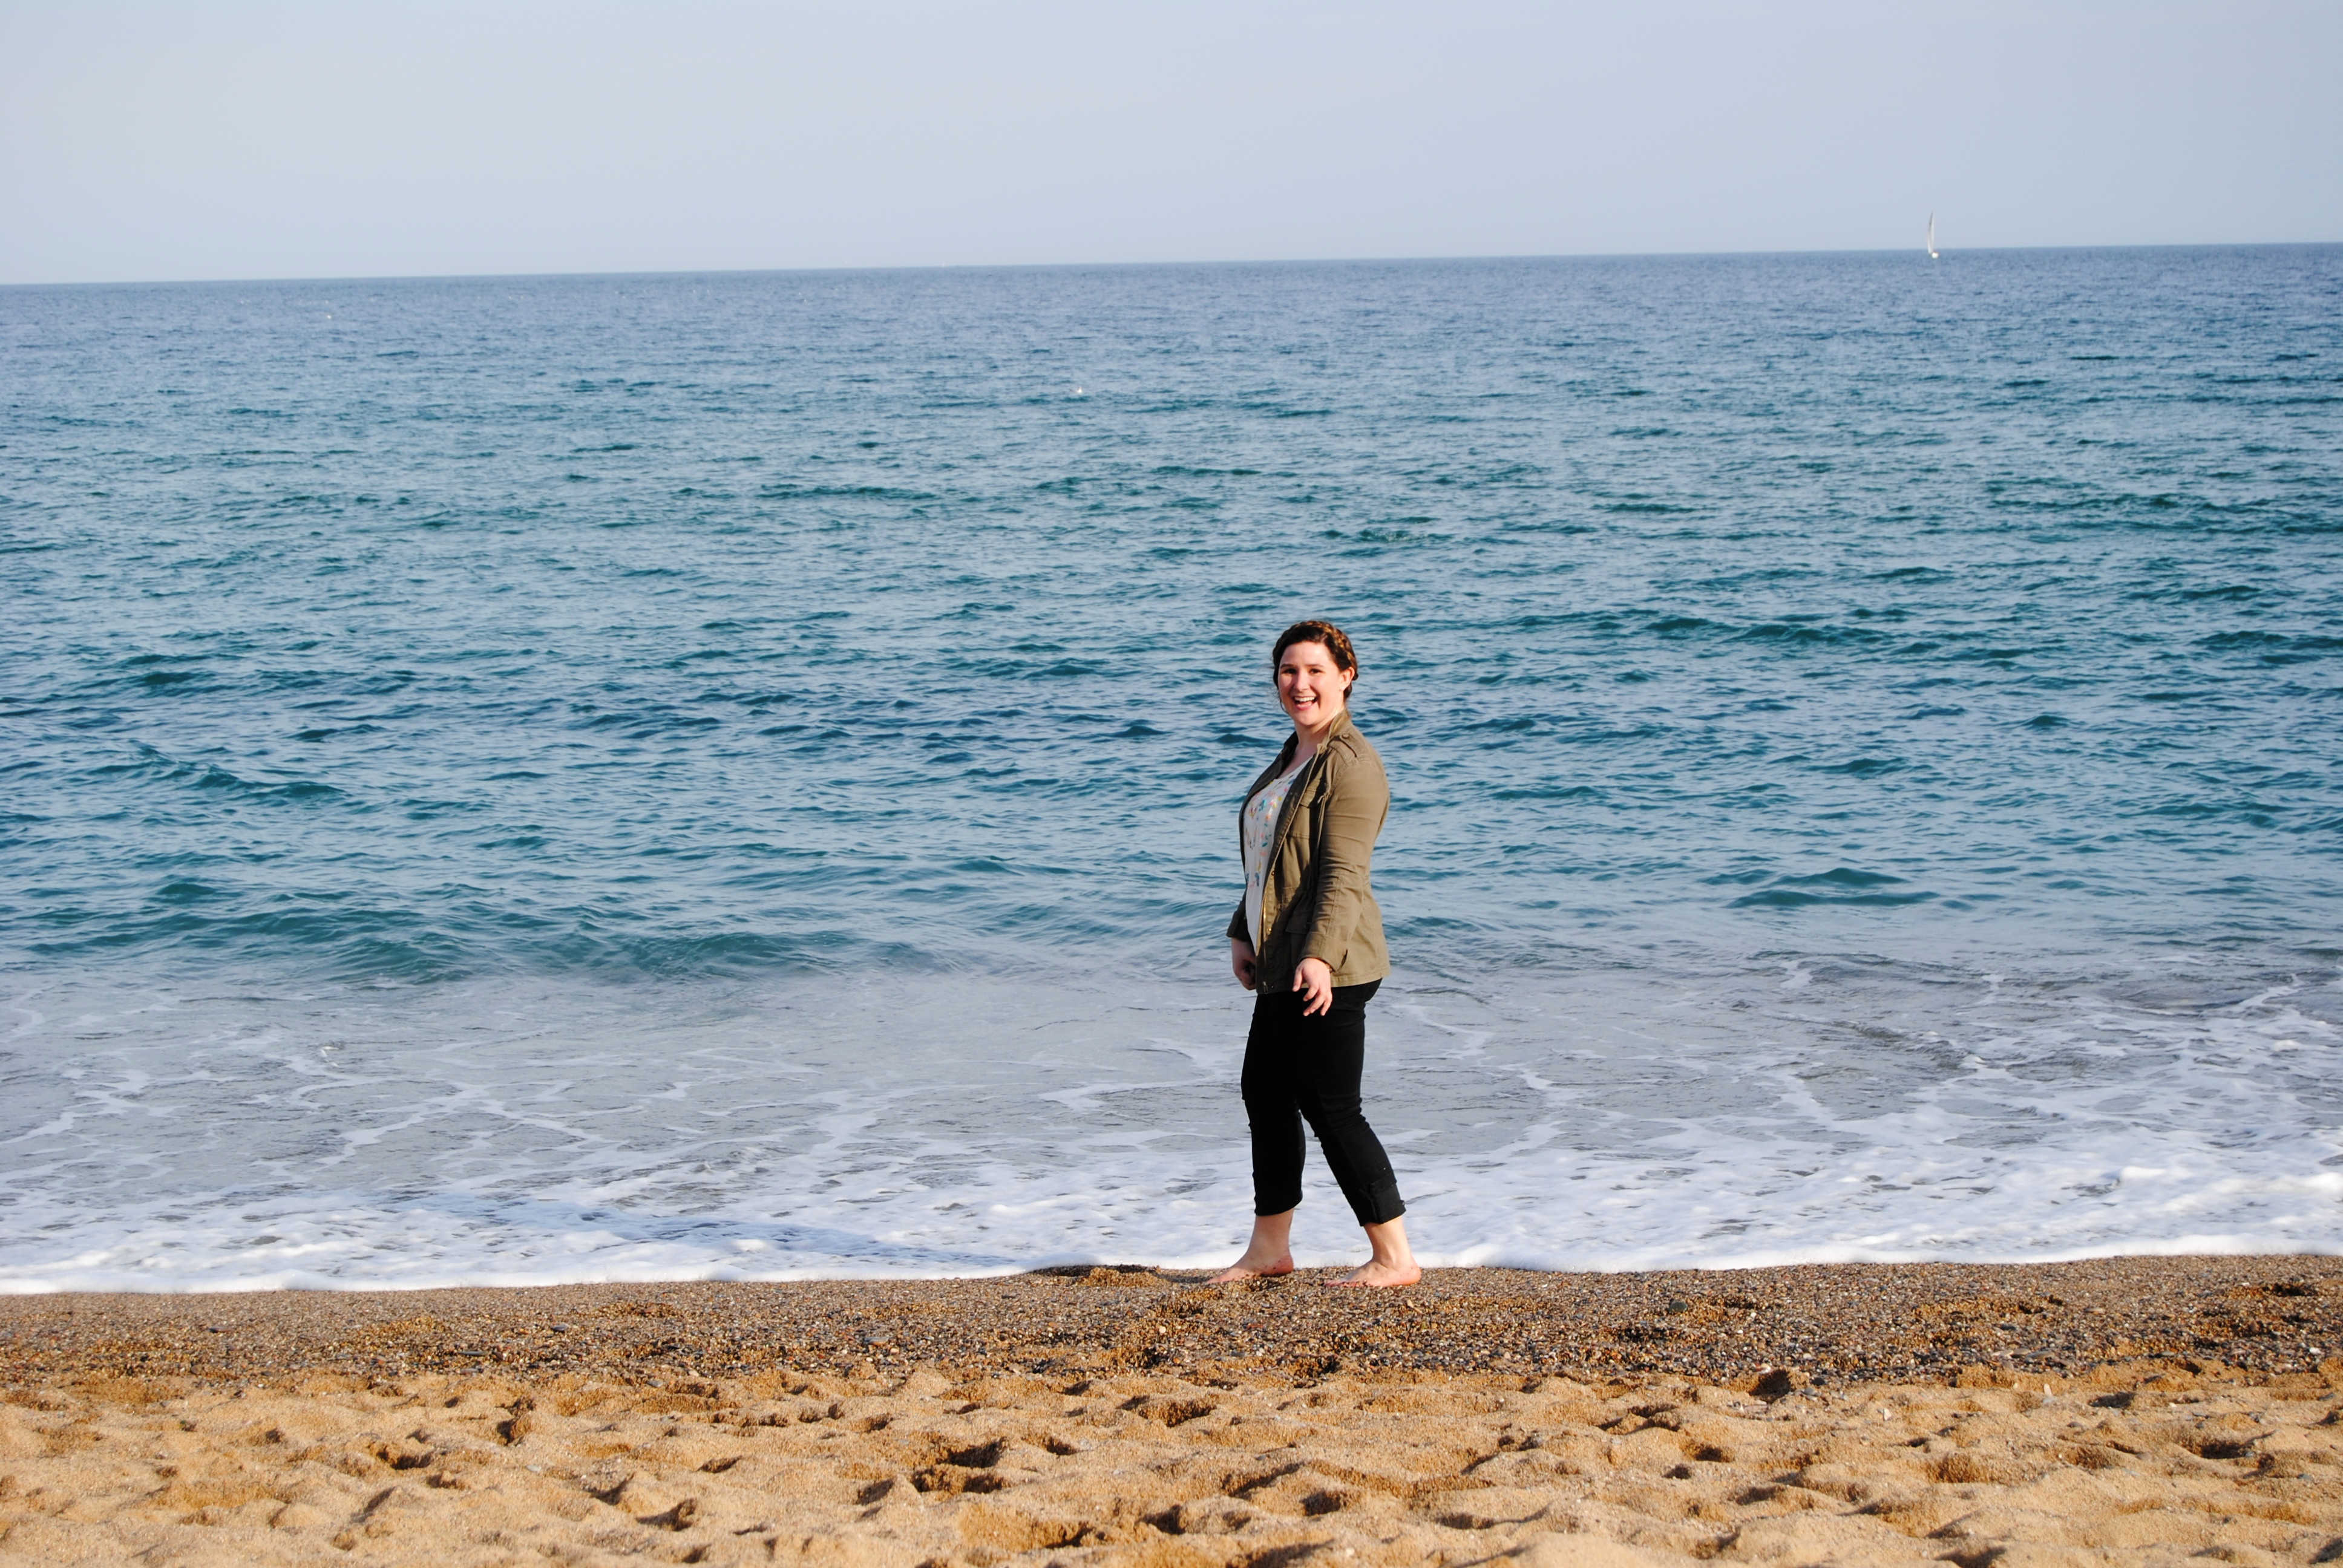 Enjoying the Mediterranean in March.